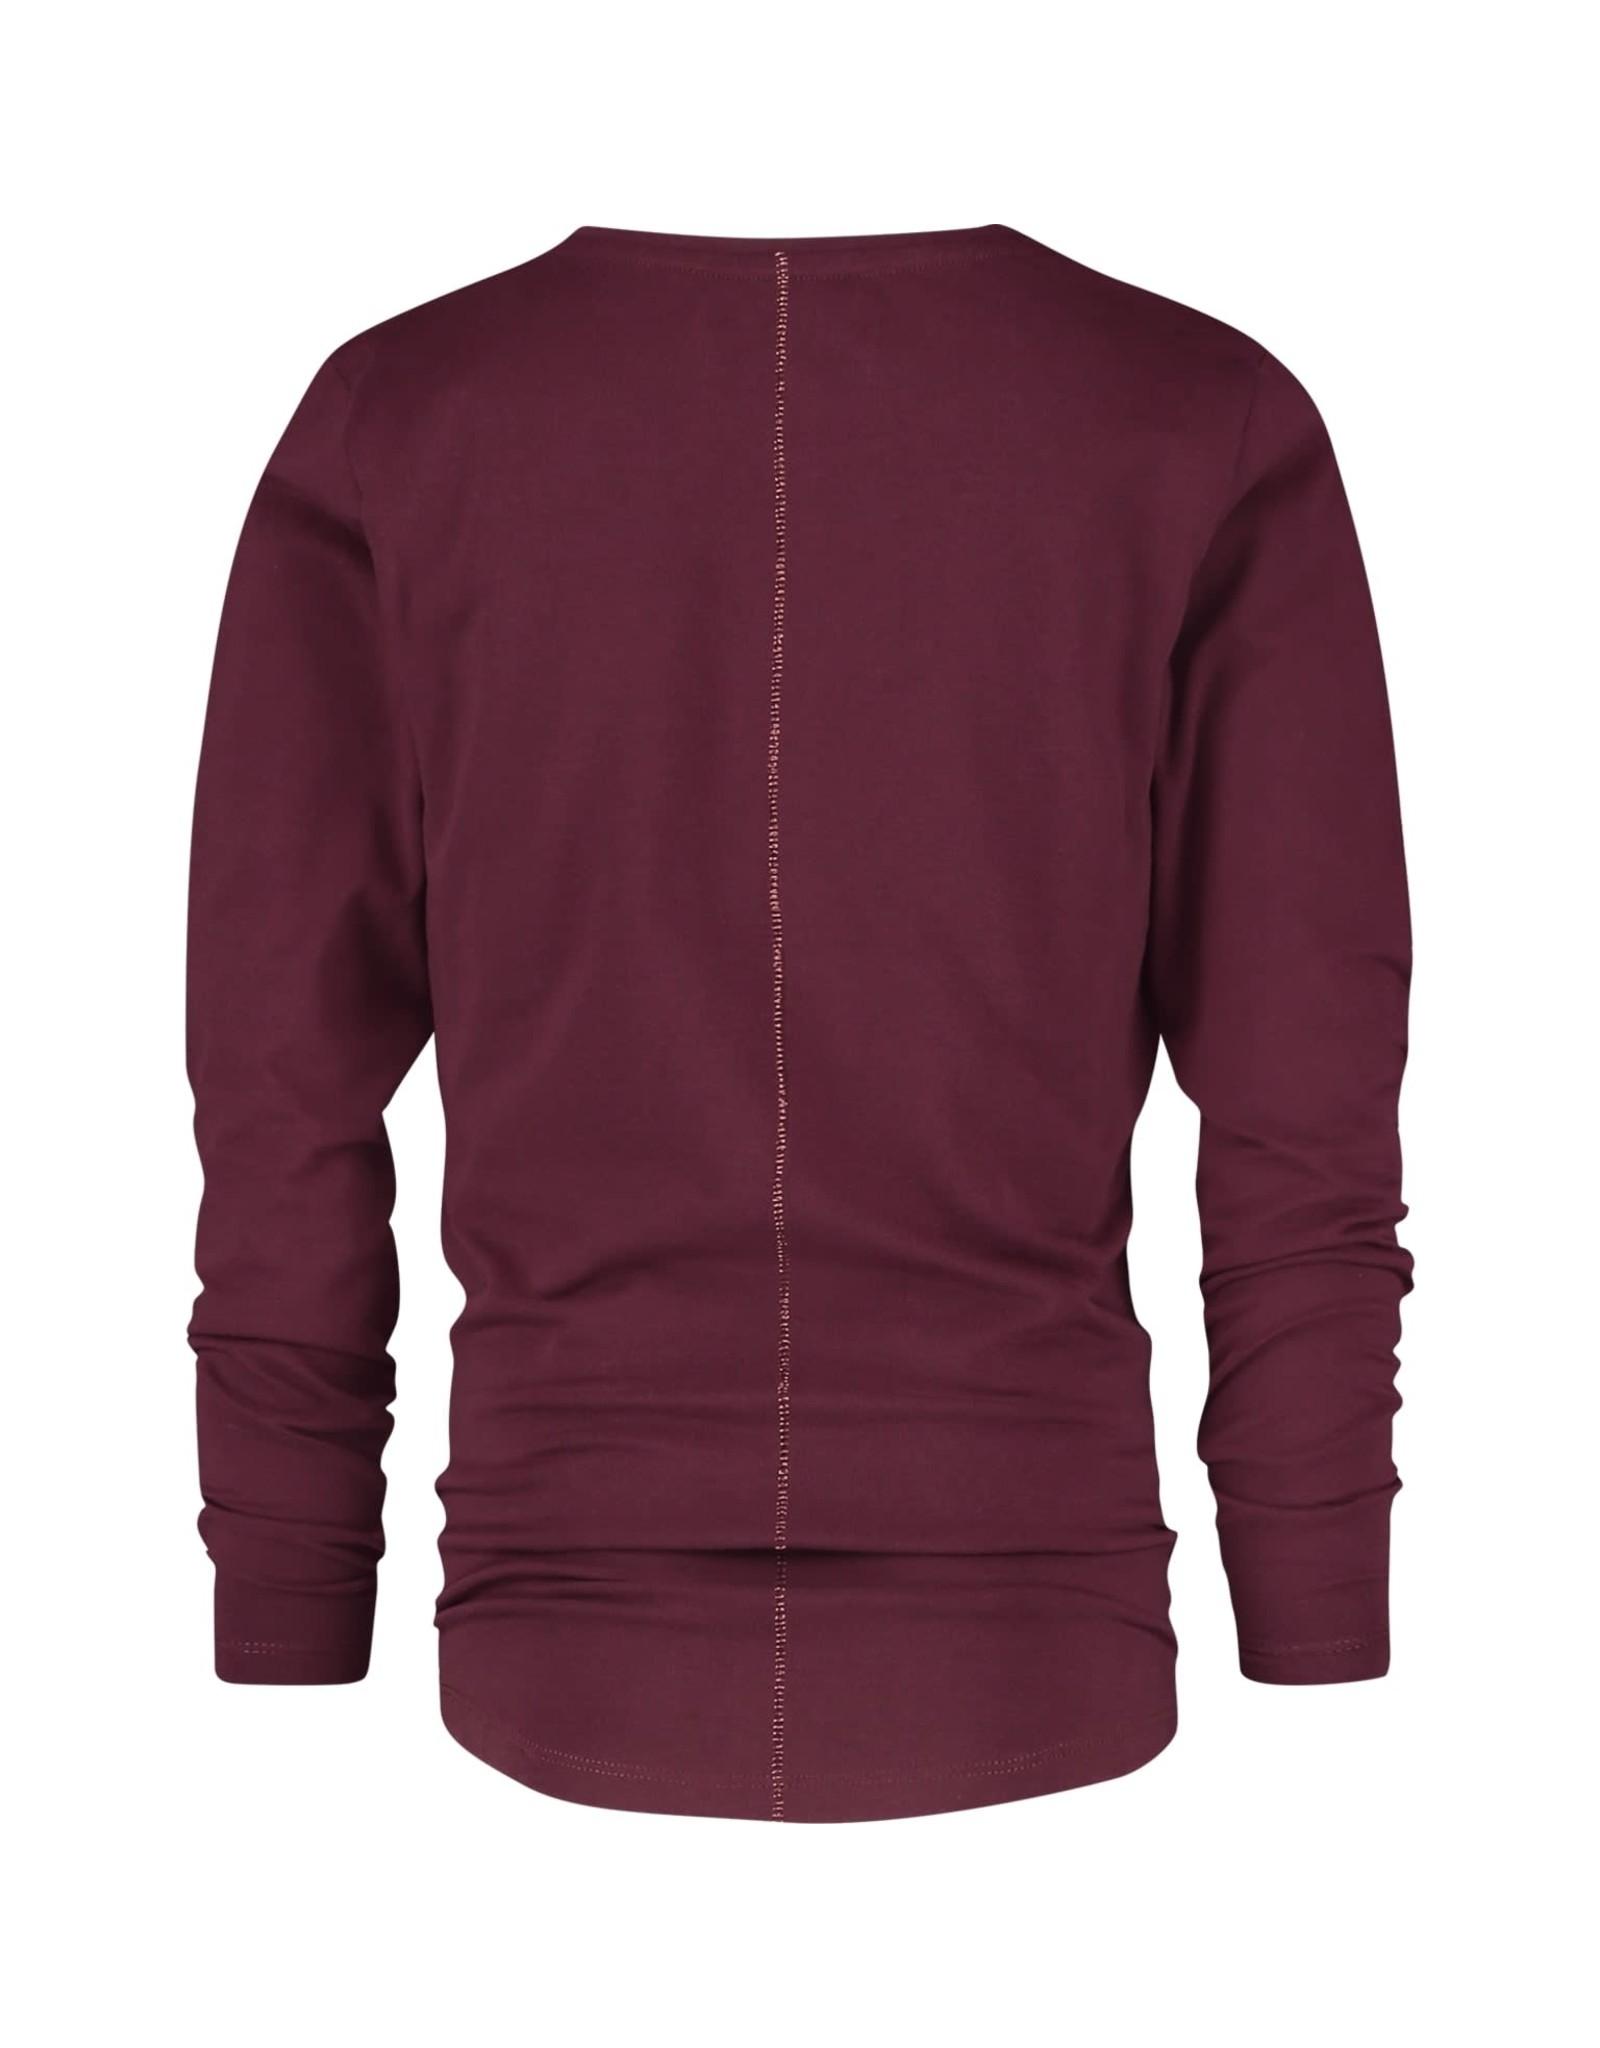 Vingino Vingino meiden shirt Jerney Bordeaux Red